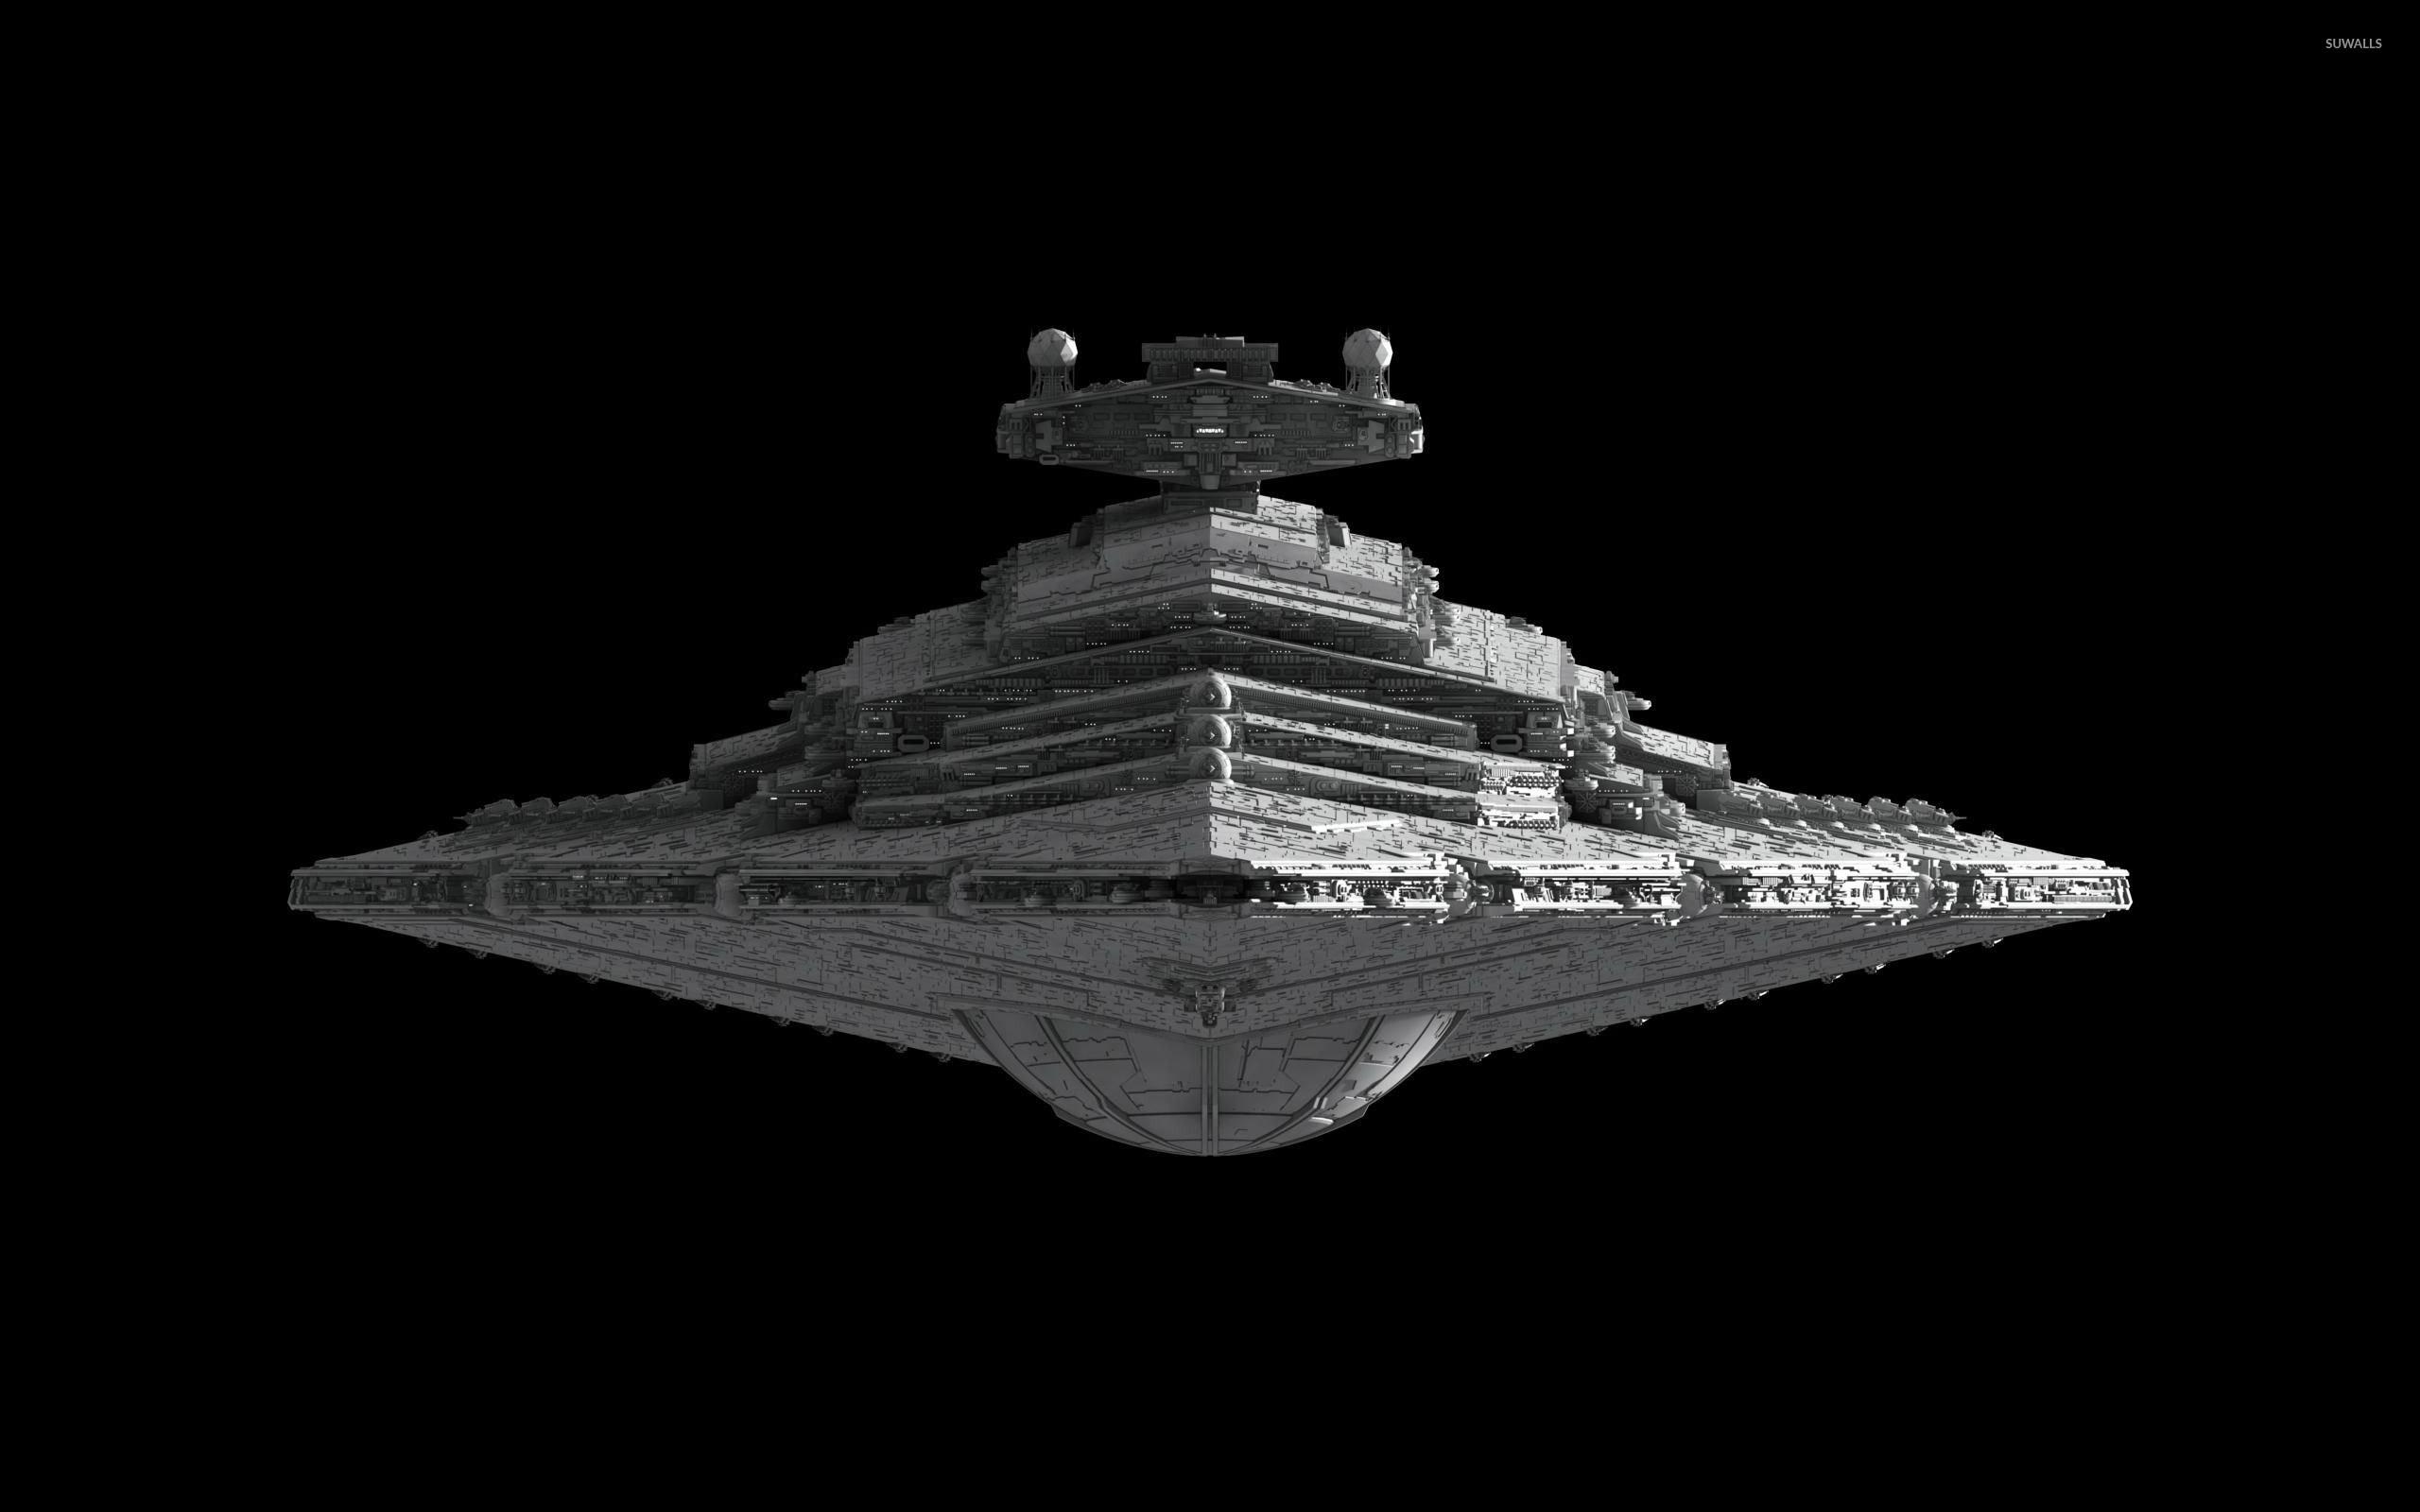 Star Destroyer Star Wars Wallpaper Movie Wallpapers 26764